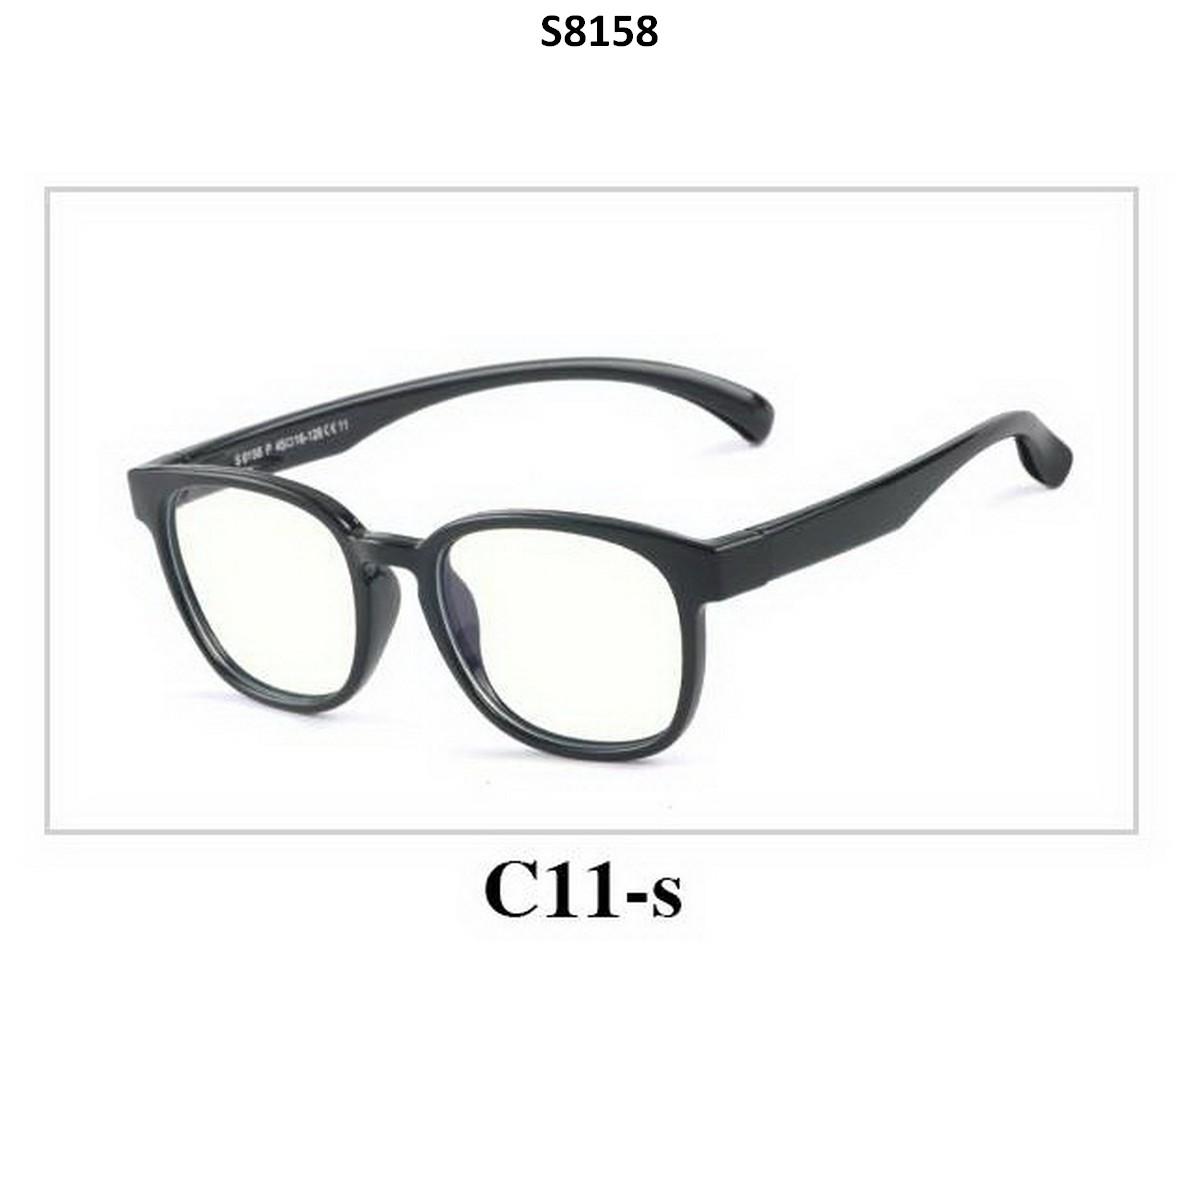 Kids Blue Light Blocker Computer Glasses Anti Blue Ray Eyeglasses S8158C11